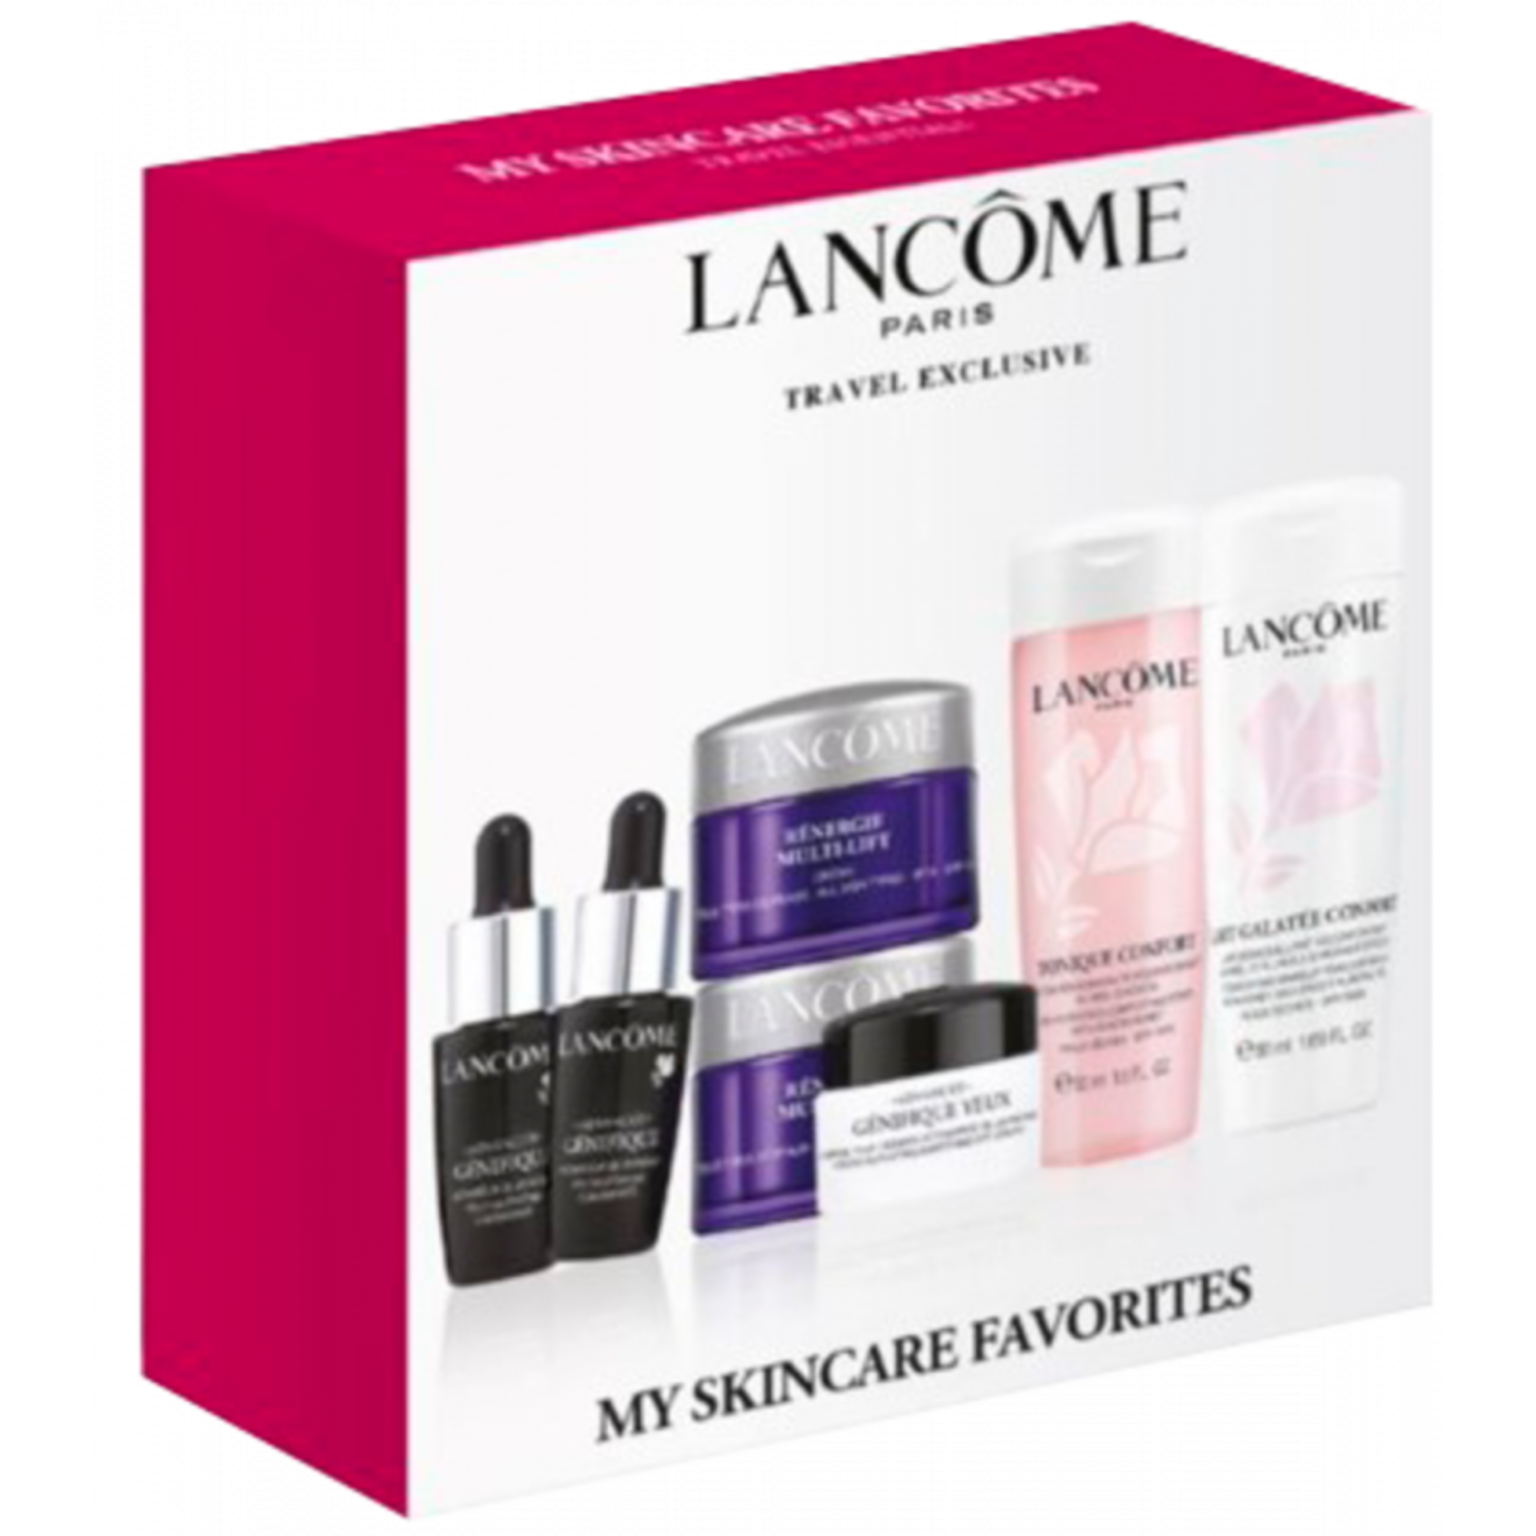 Lancôme My Skincare Favorites